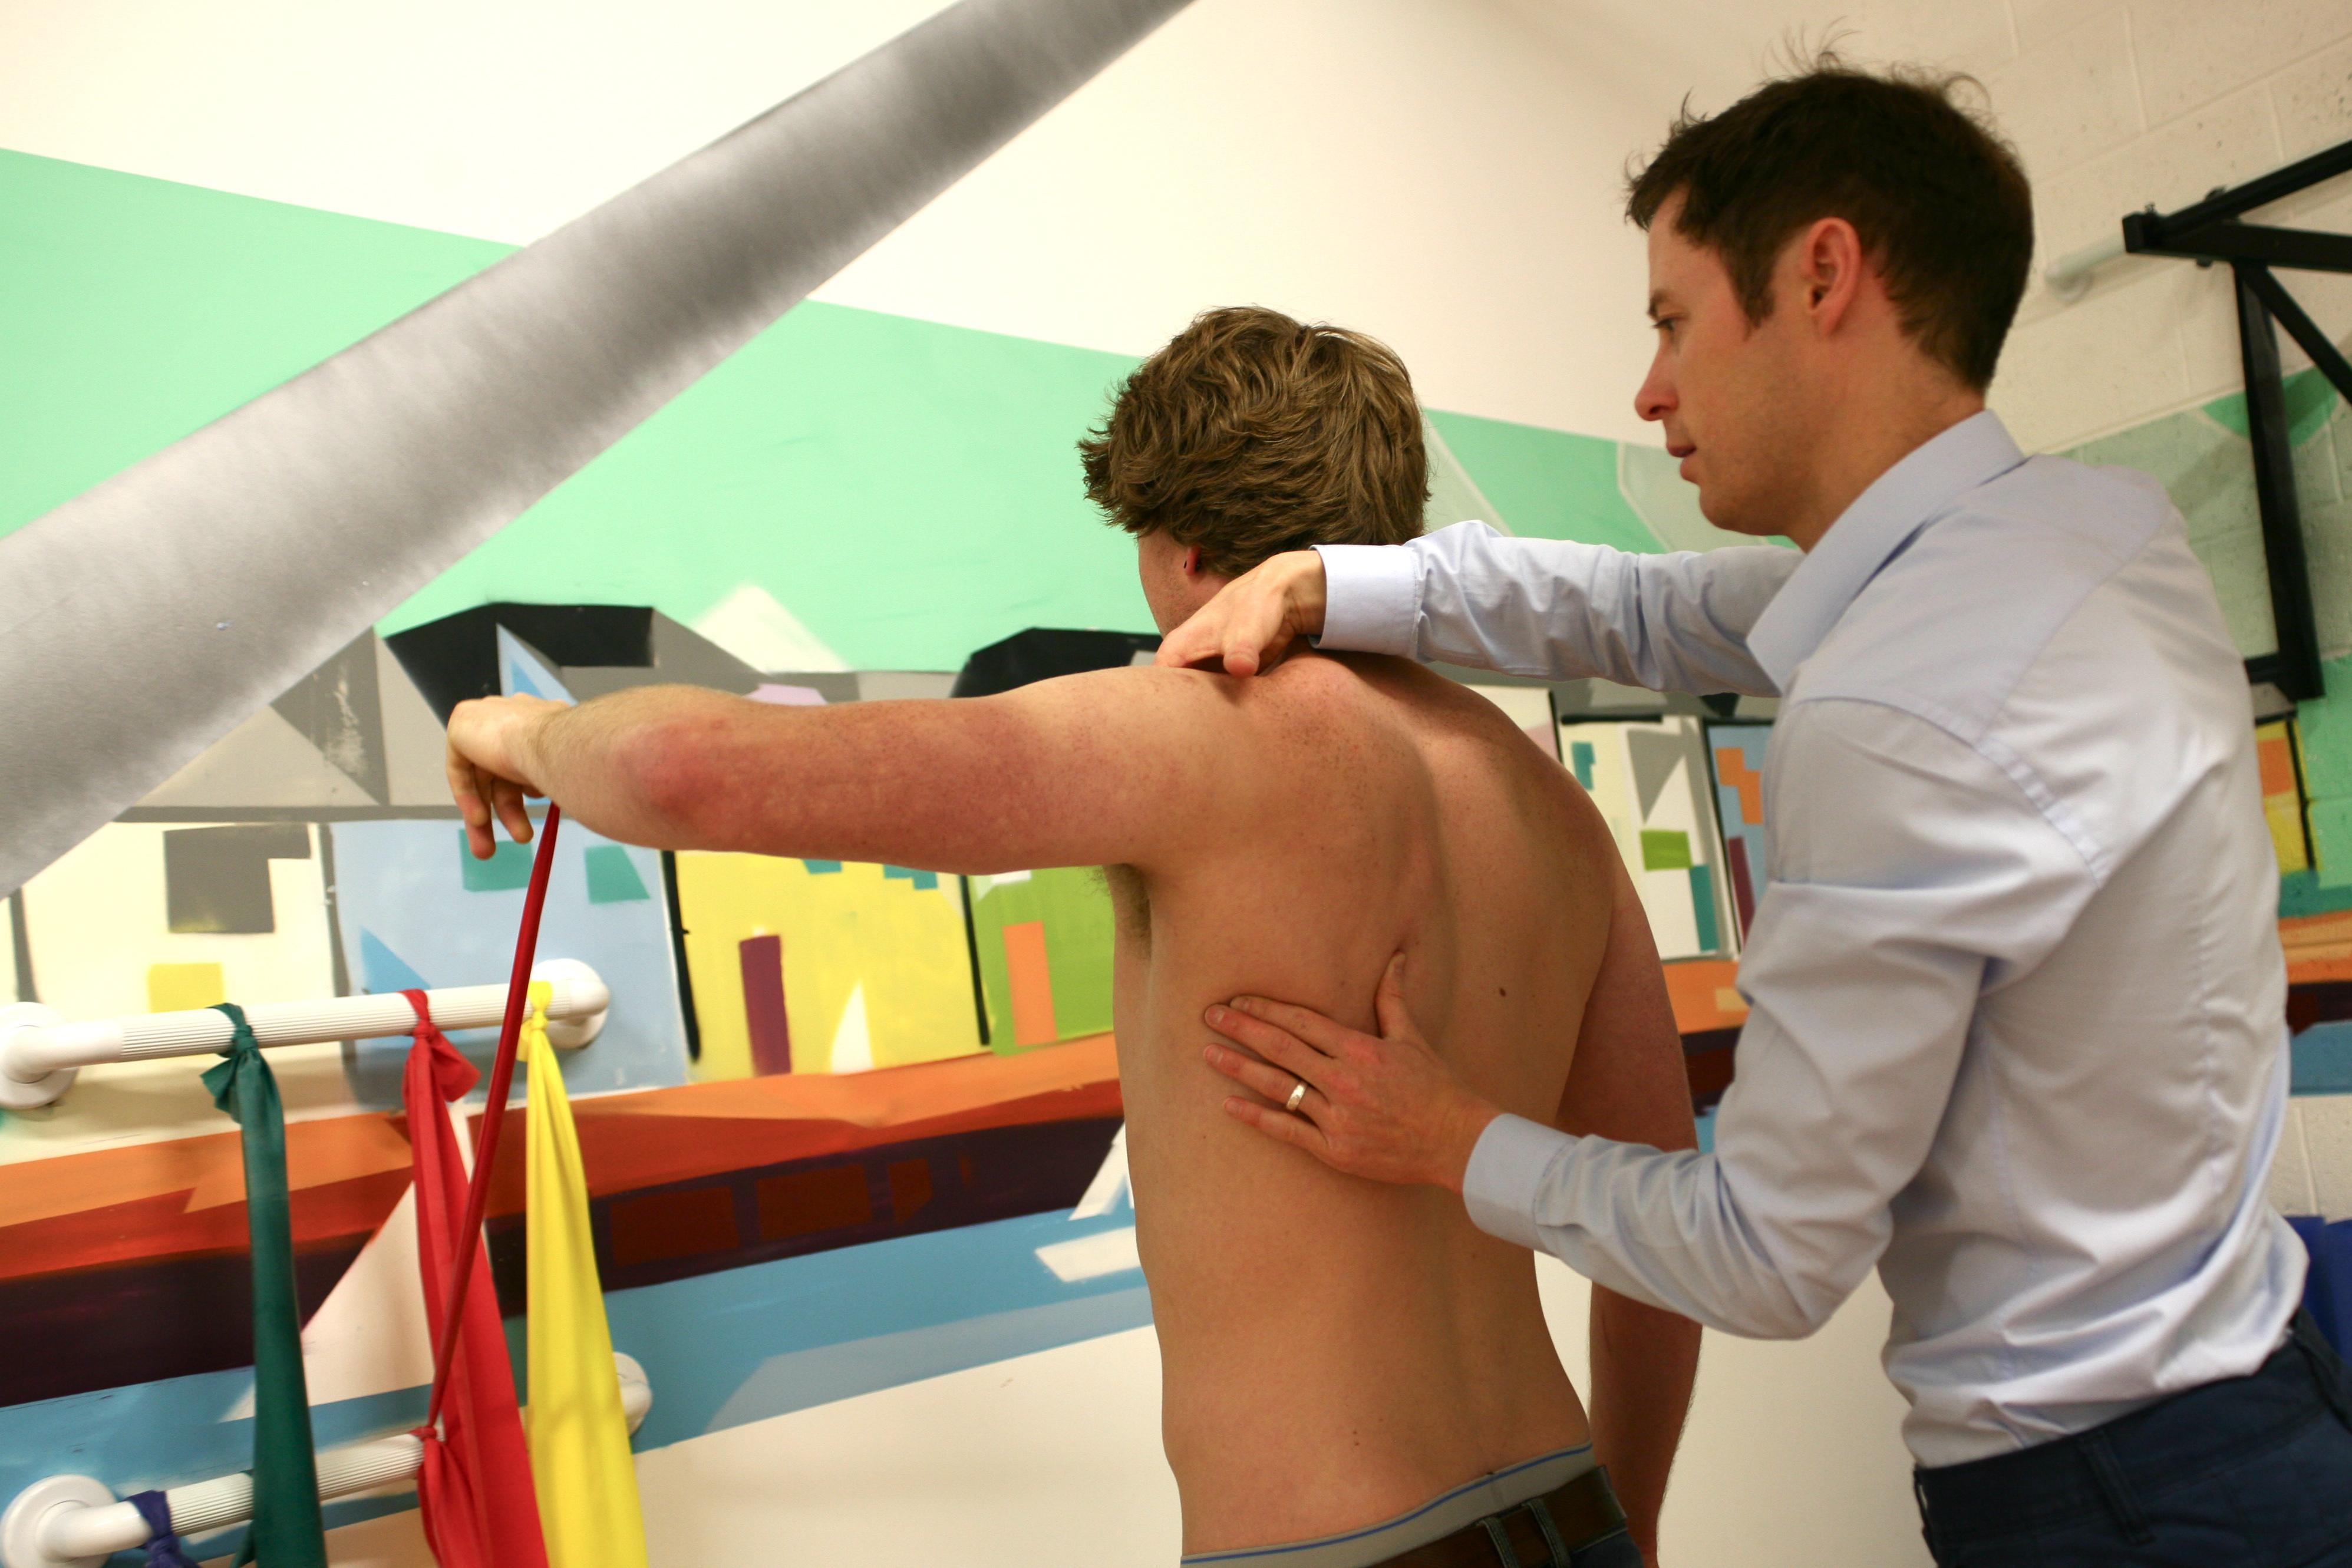 Eoin O Conaire Shoulder rehabilitation